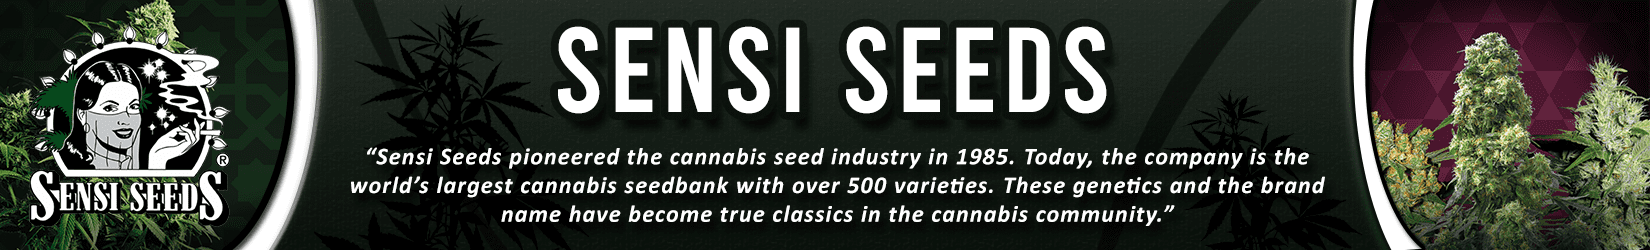 Cannabis Seeds Breeder - Sensi Seeds